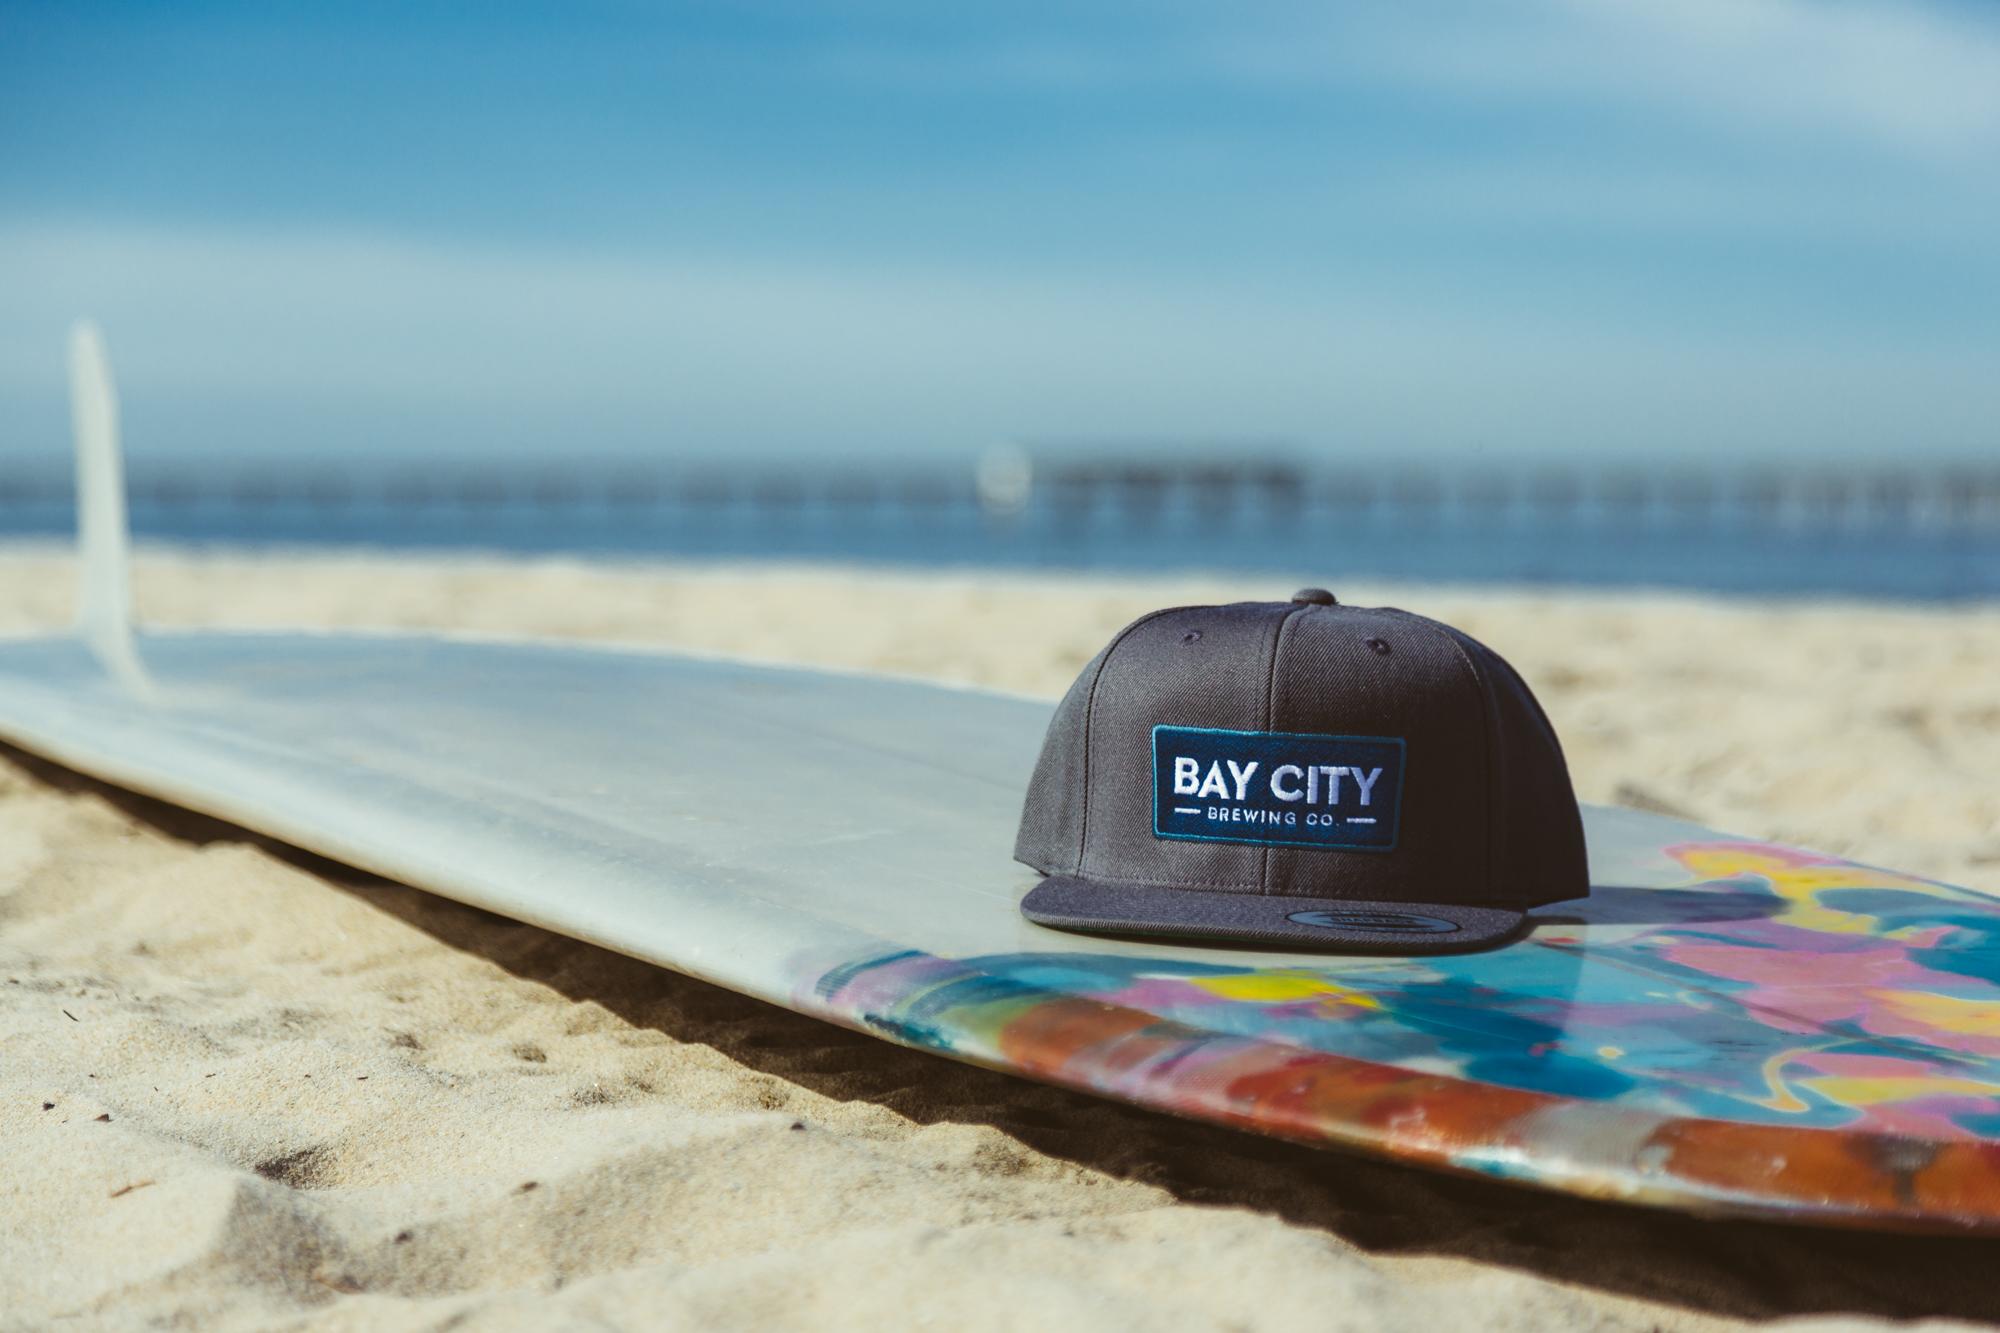 bay city-1689.JPG